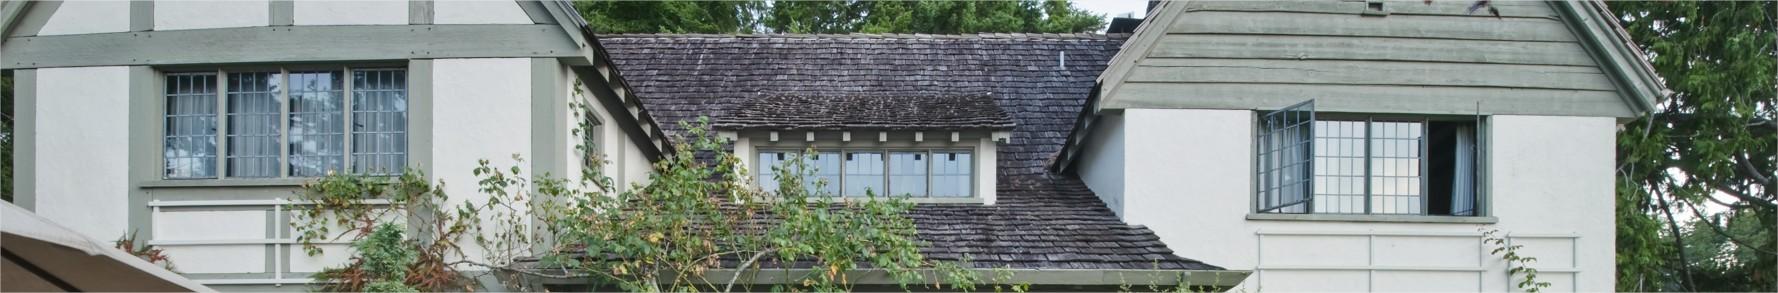 Maisons d'hébergement